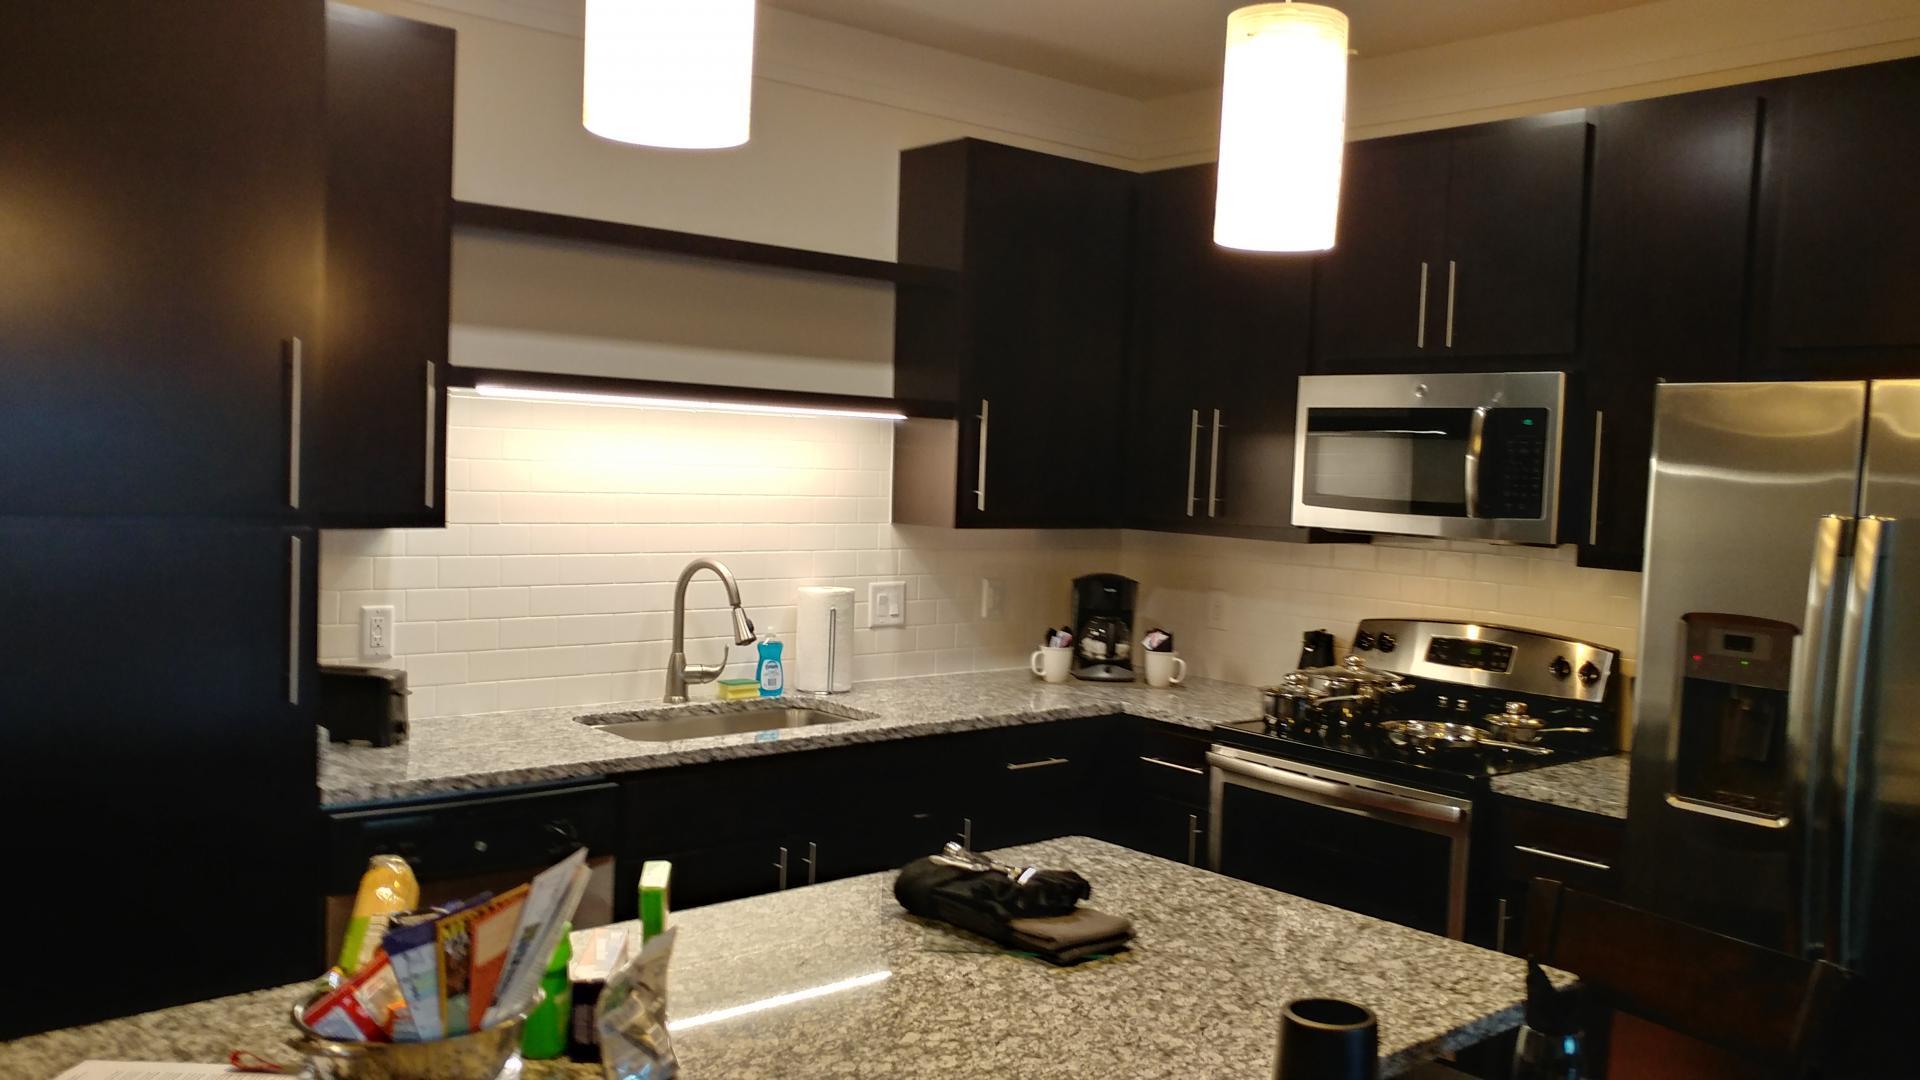 Kitchen at Vanguard Heights Apartments